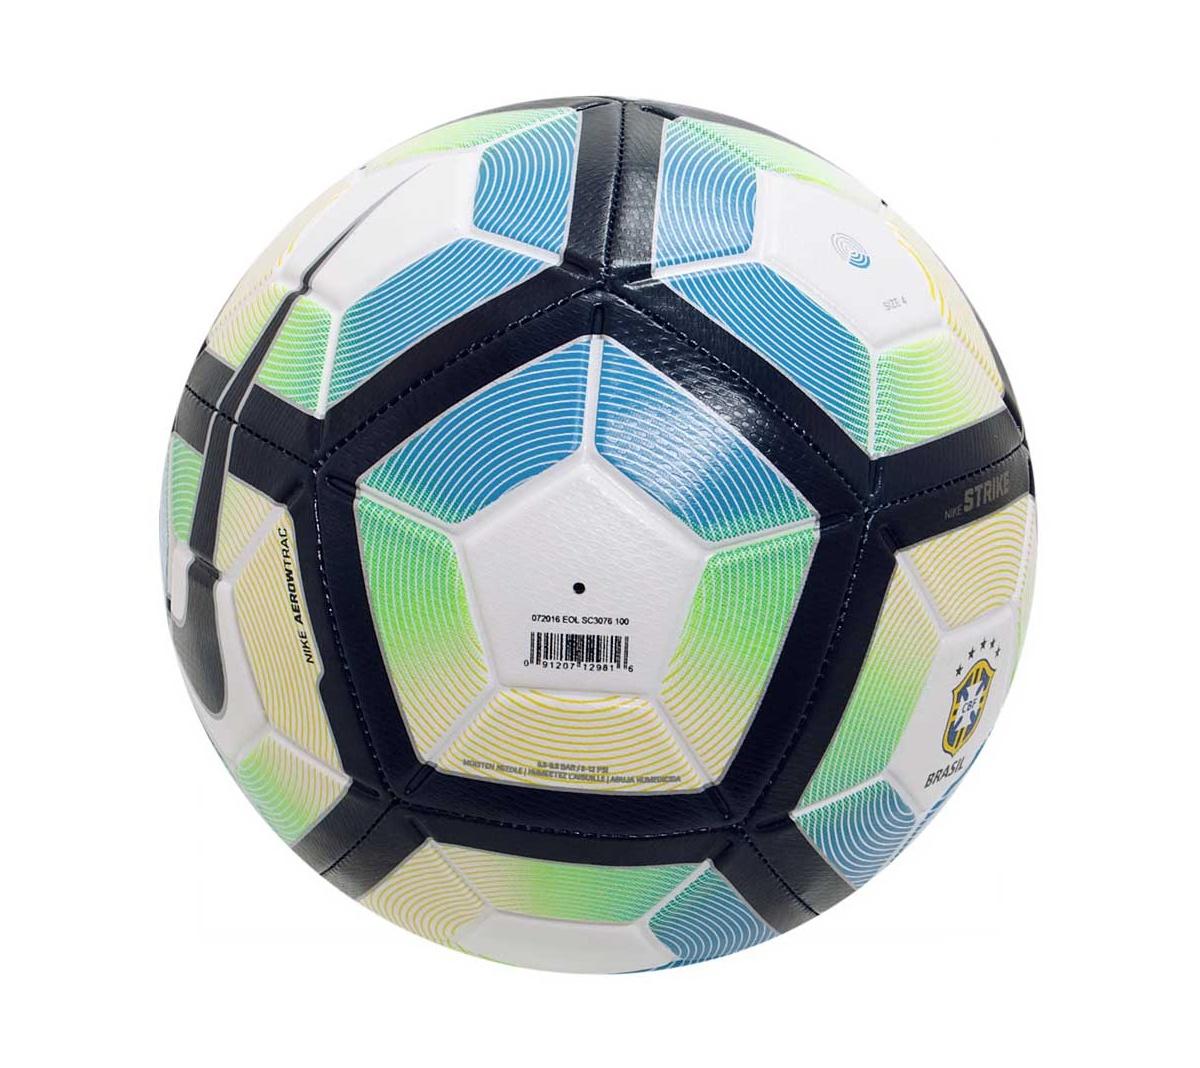 97f04eacb5 fashion style 1e832 3721c nike strike cbf soccer ball - livebolaku.com